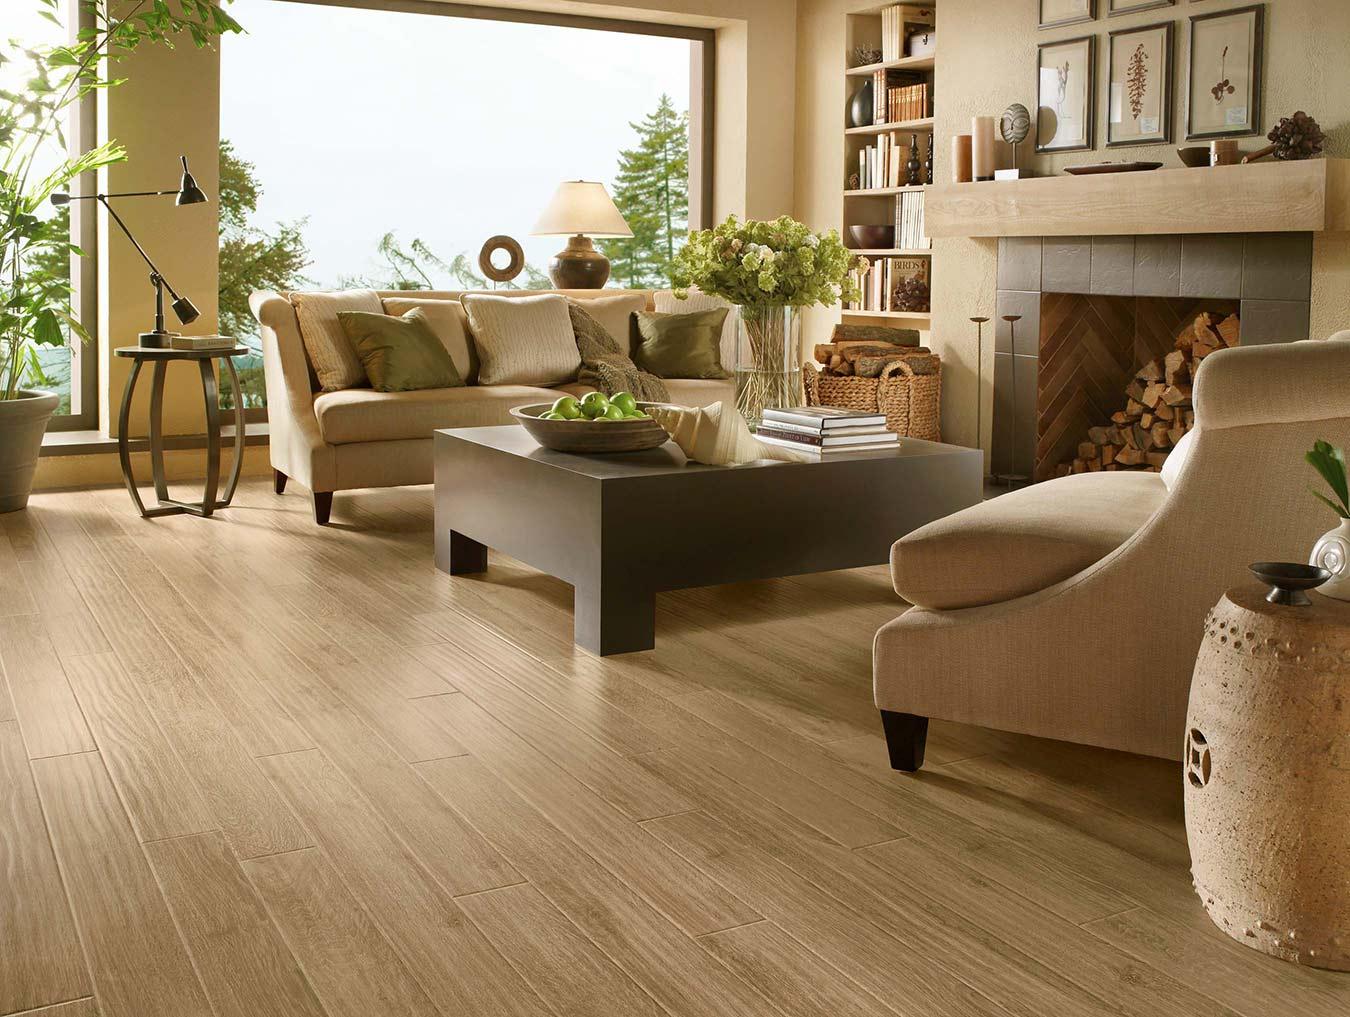 Laminate Flooring Living Room Laminate02 A